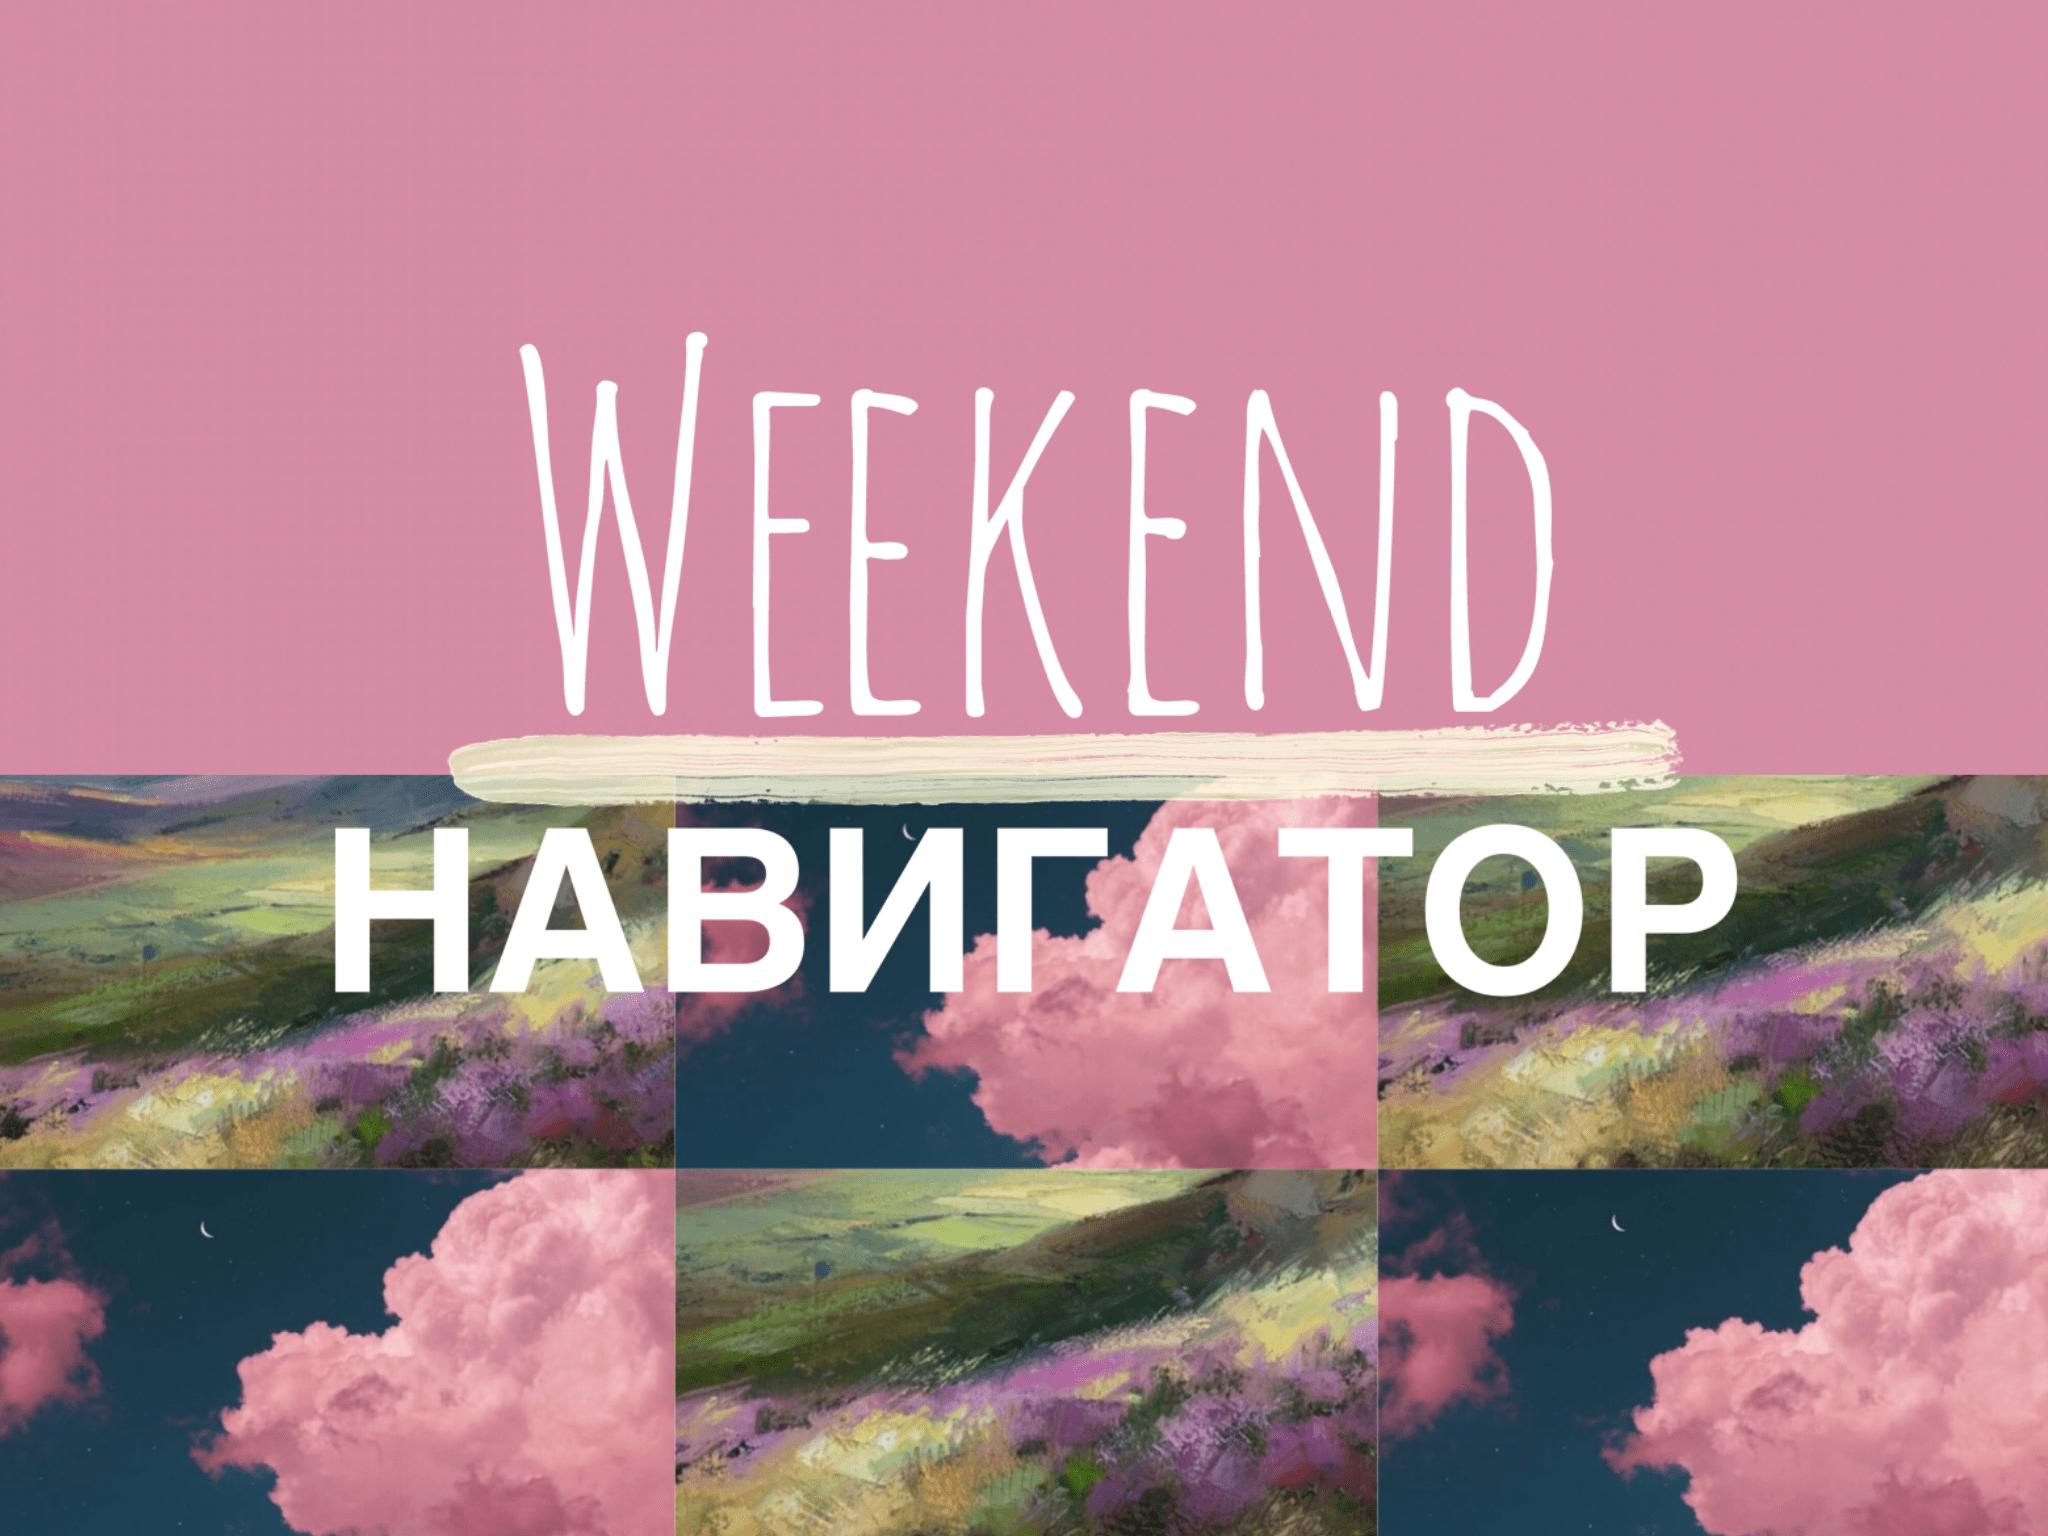 IMG 0486 WeekEnd Навигатор Weekend-Навигатор, афиша, афиша Тбилиси, выставка, Грузия, концерт, отдых, тбилиси, туризм